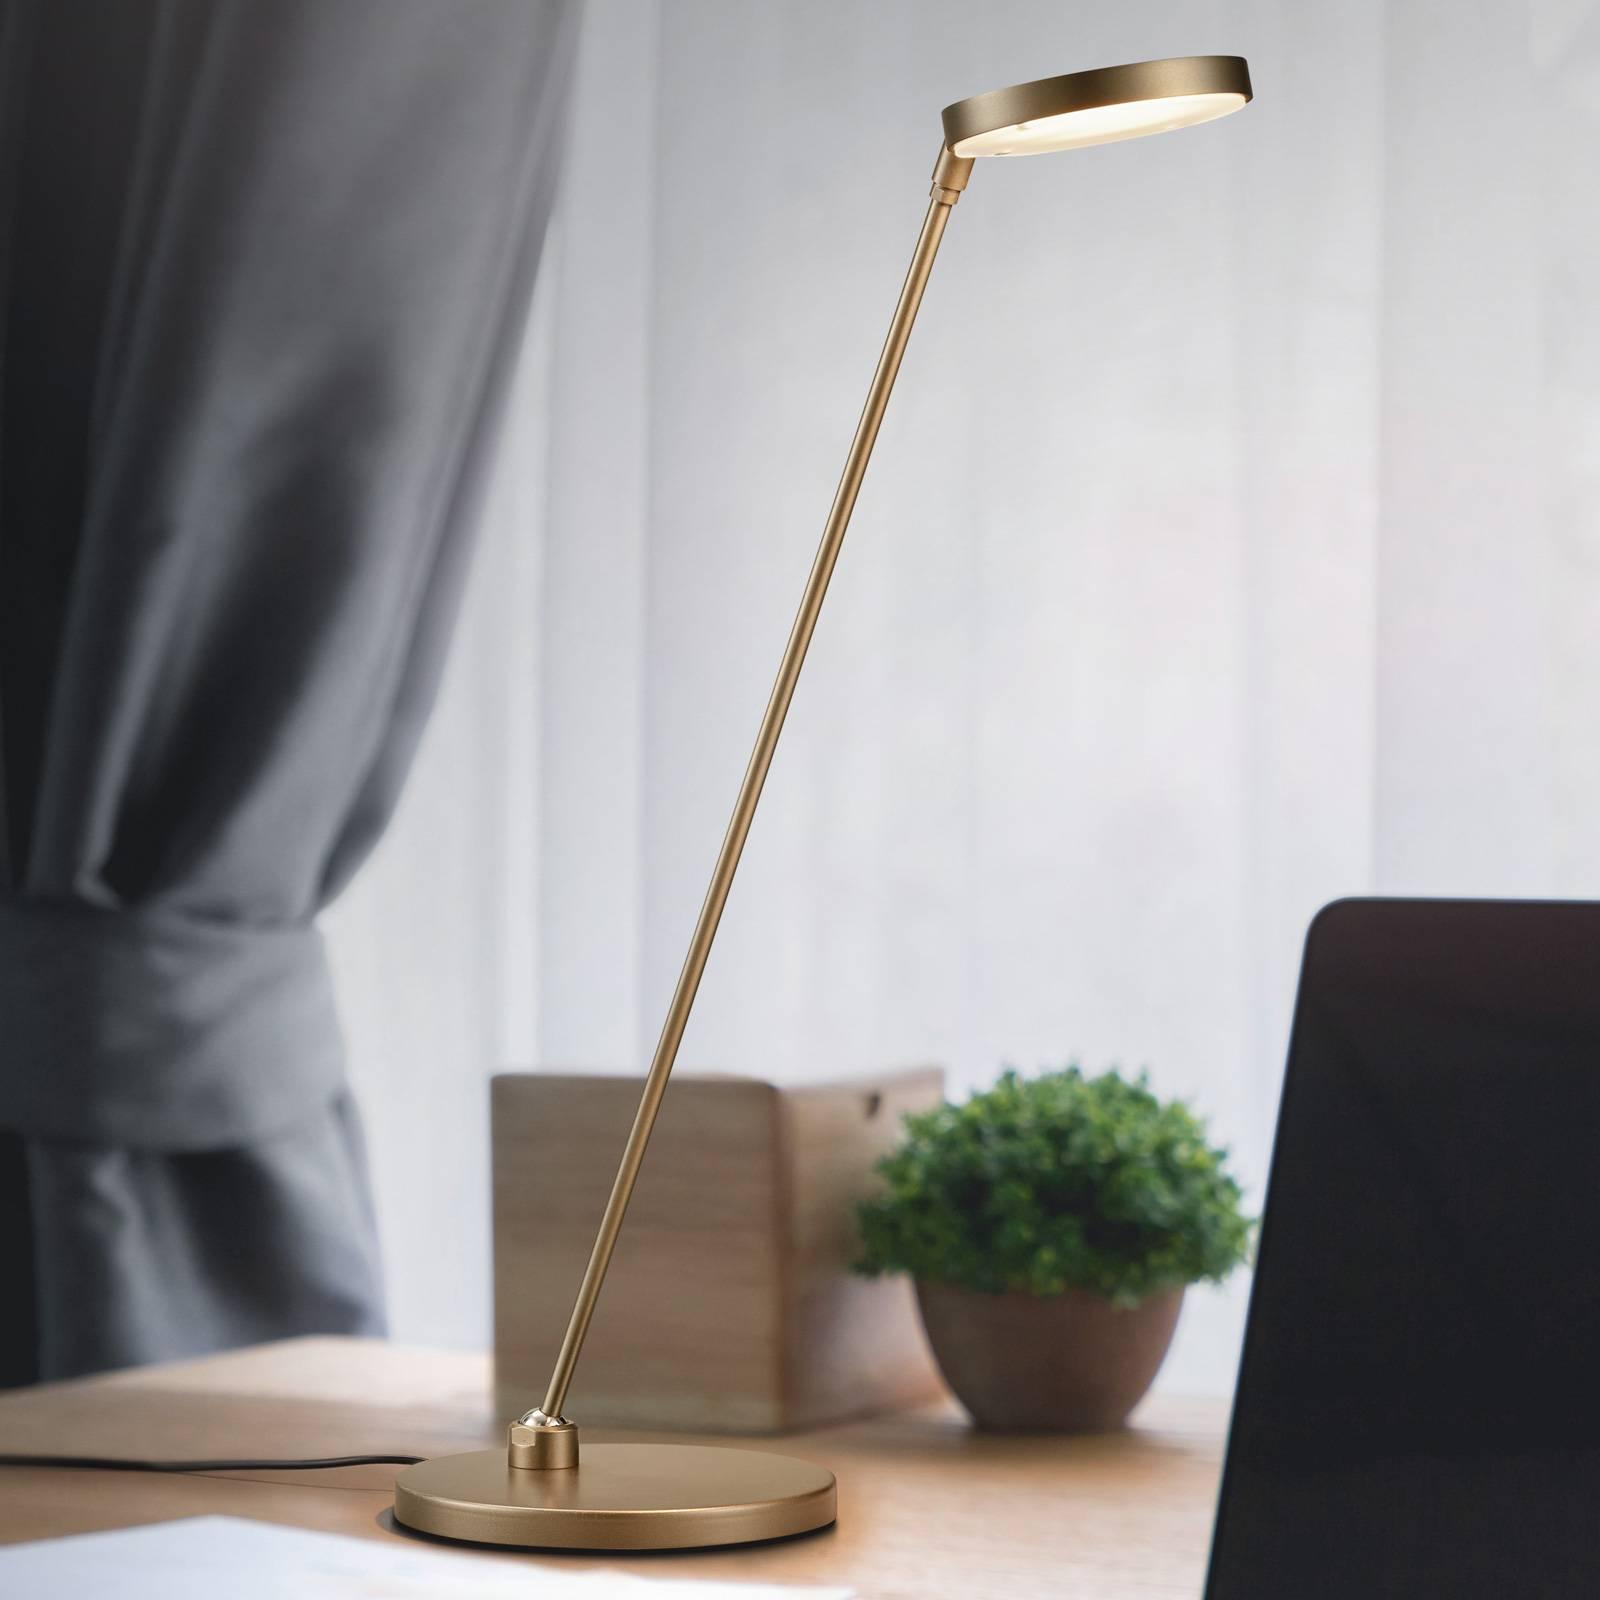 LED-pöytälamppu Thea-T, pronsi